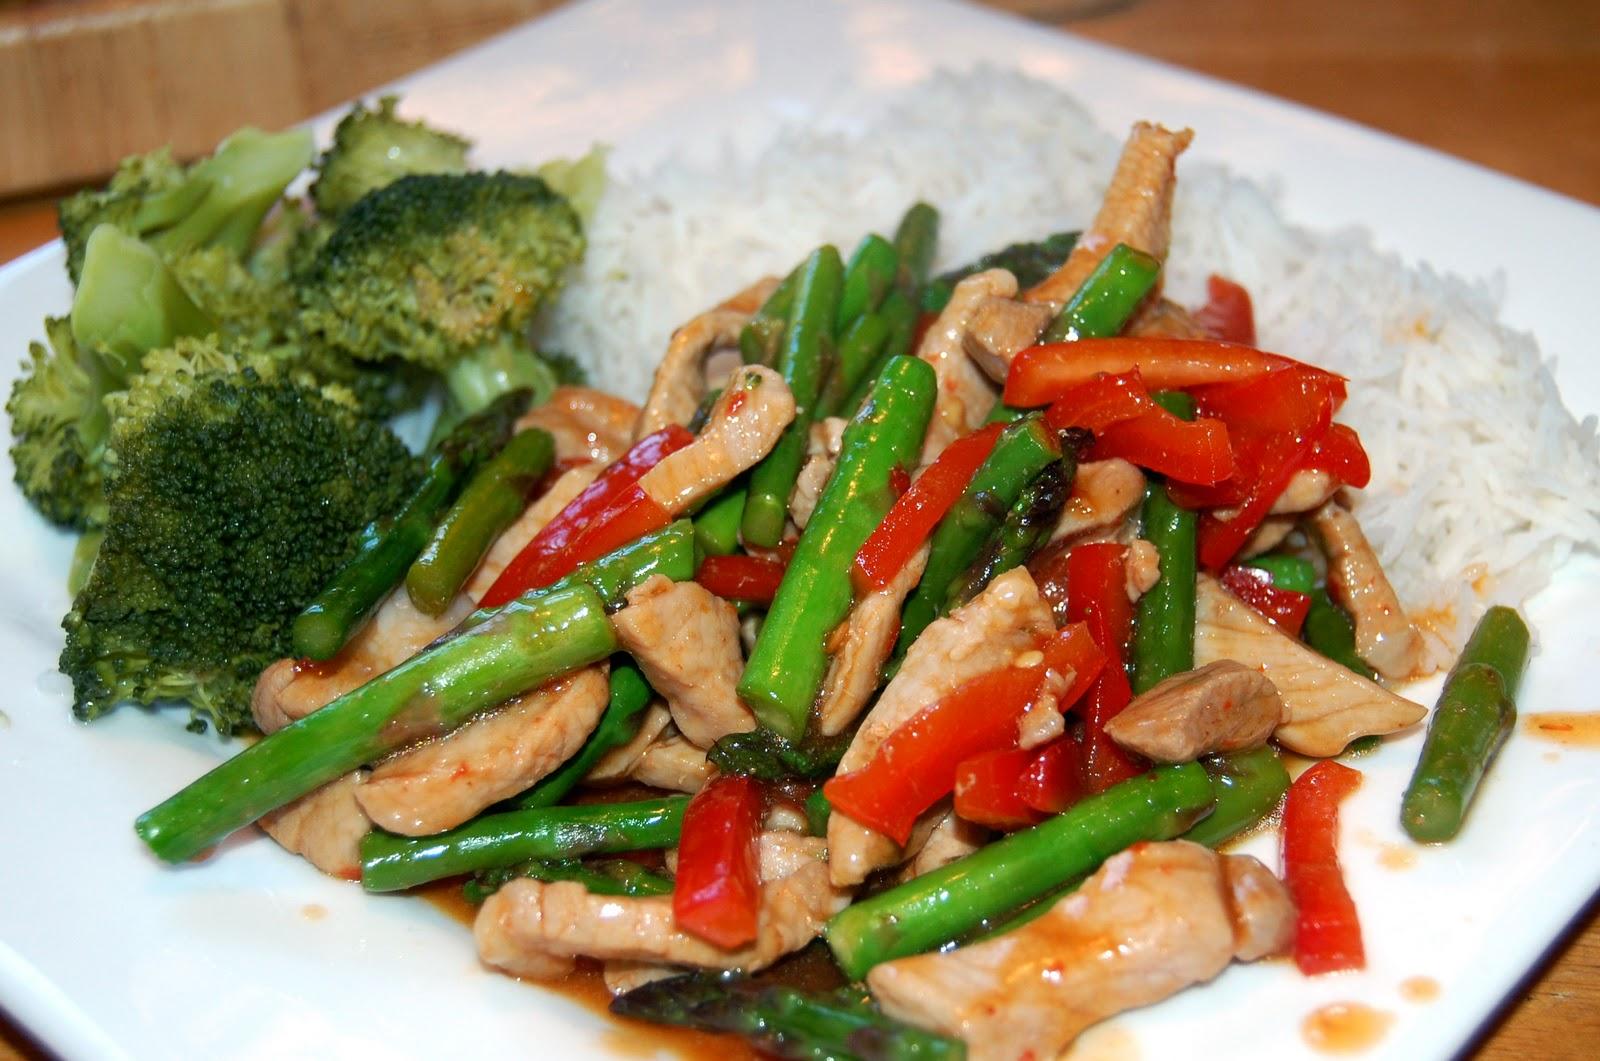 Seth's Food Blog: Pork/Asparagus/Red Pepper Stir Fry